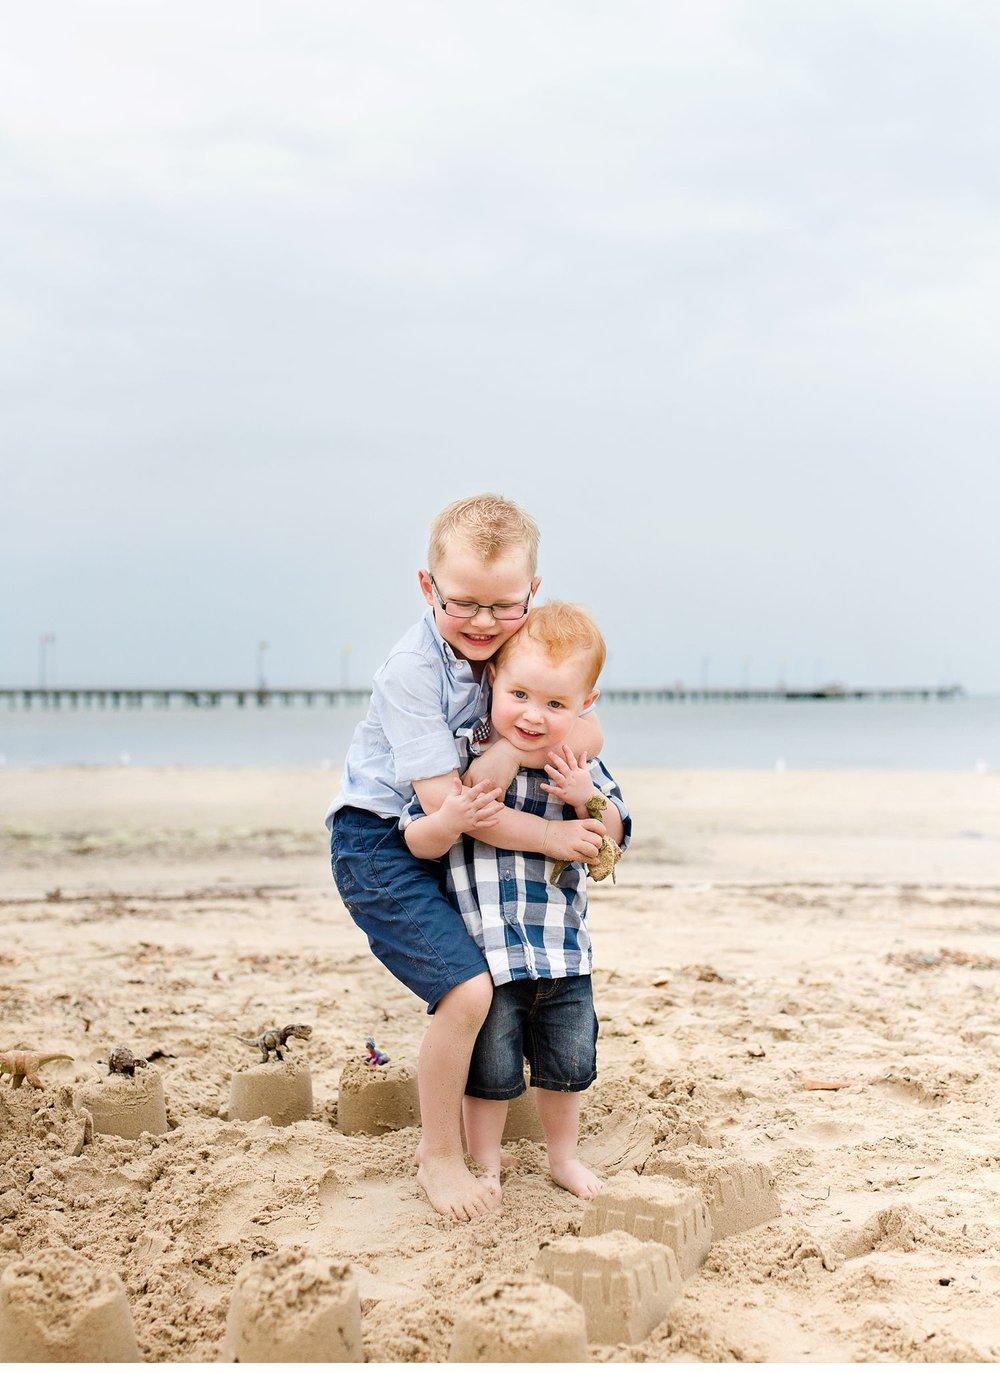 sibling-photography-bec-stewart.jpg